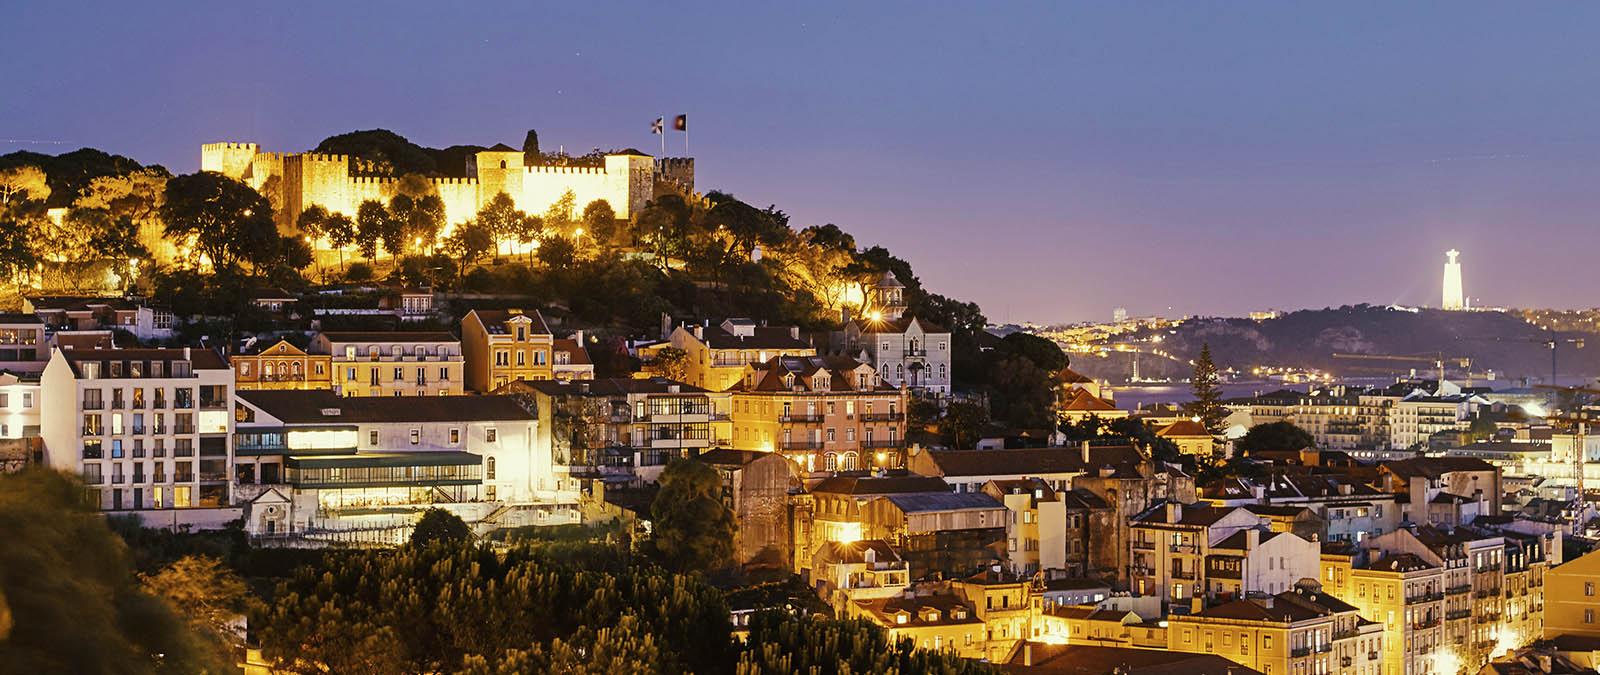 Lisbon City at night.